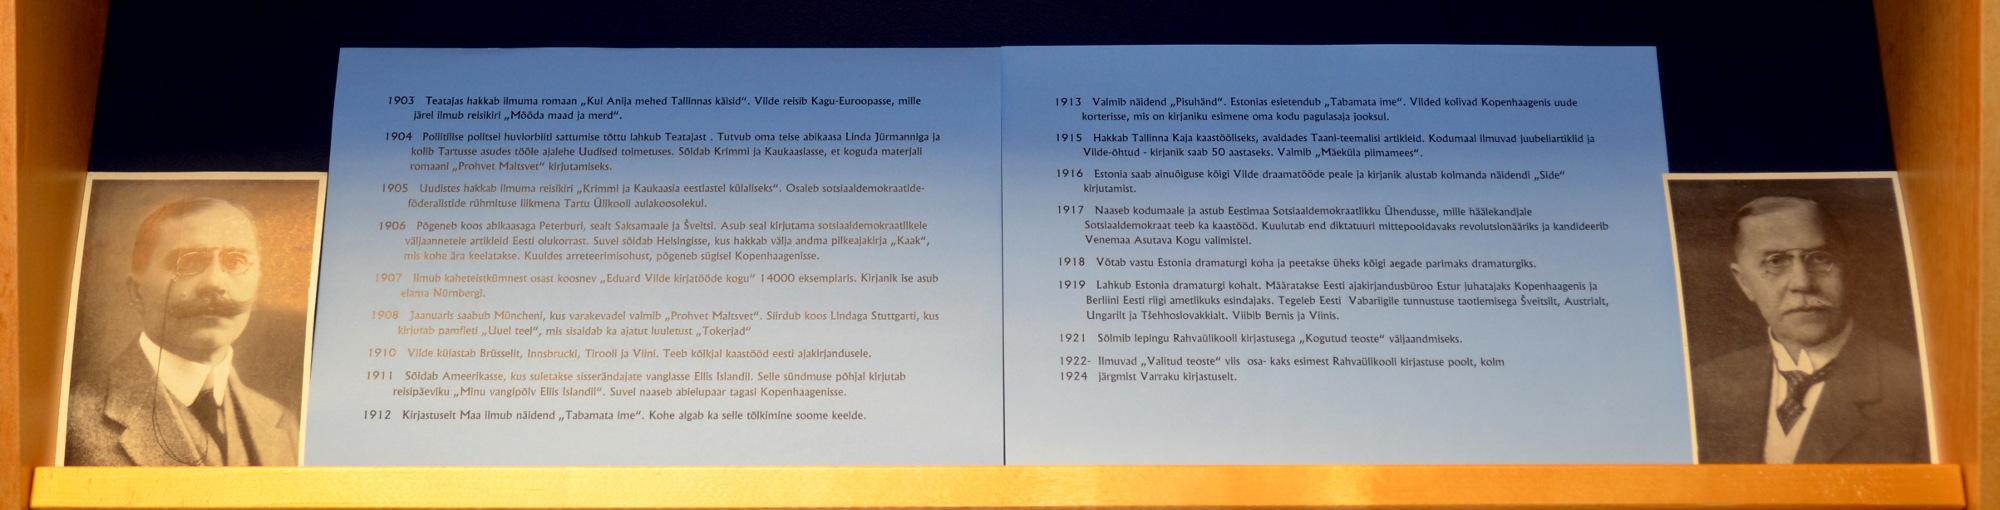 Eesti esimene krimi‑, nalja‑, reisi- ja romaanikirjanik. Eduard Vilde 150